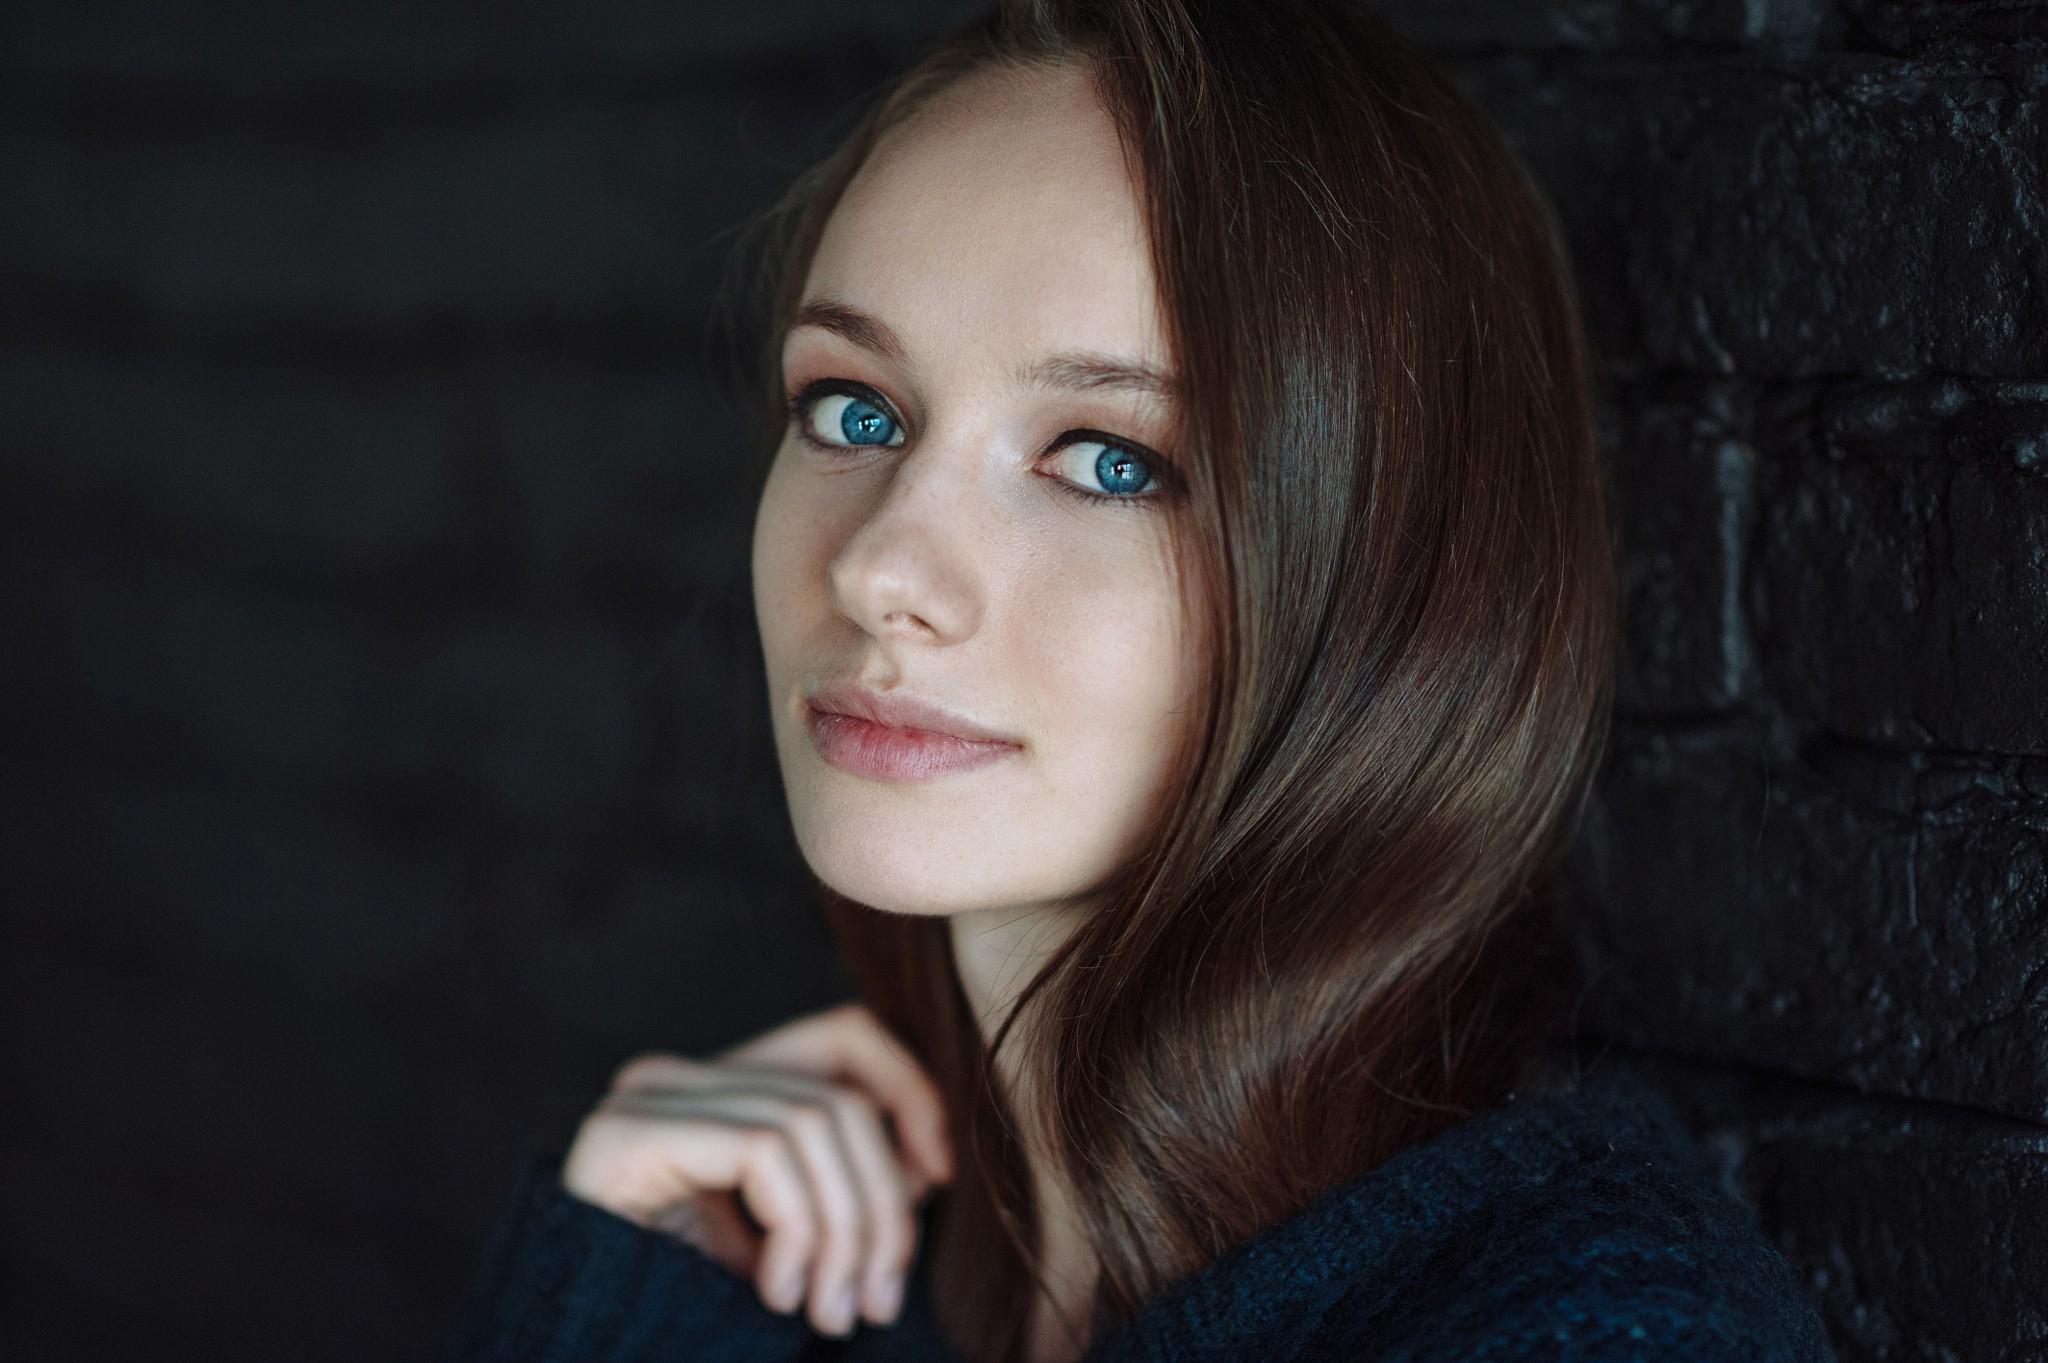 Wallpaper : face, women, model, depth of field, long hair